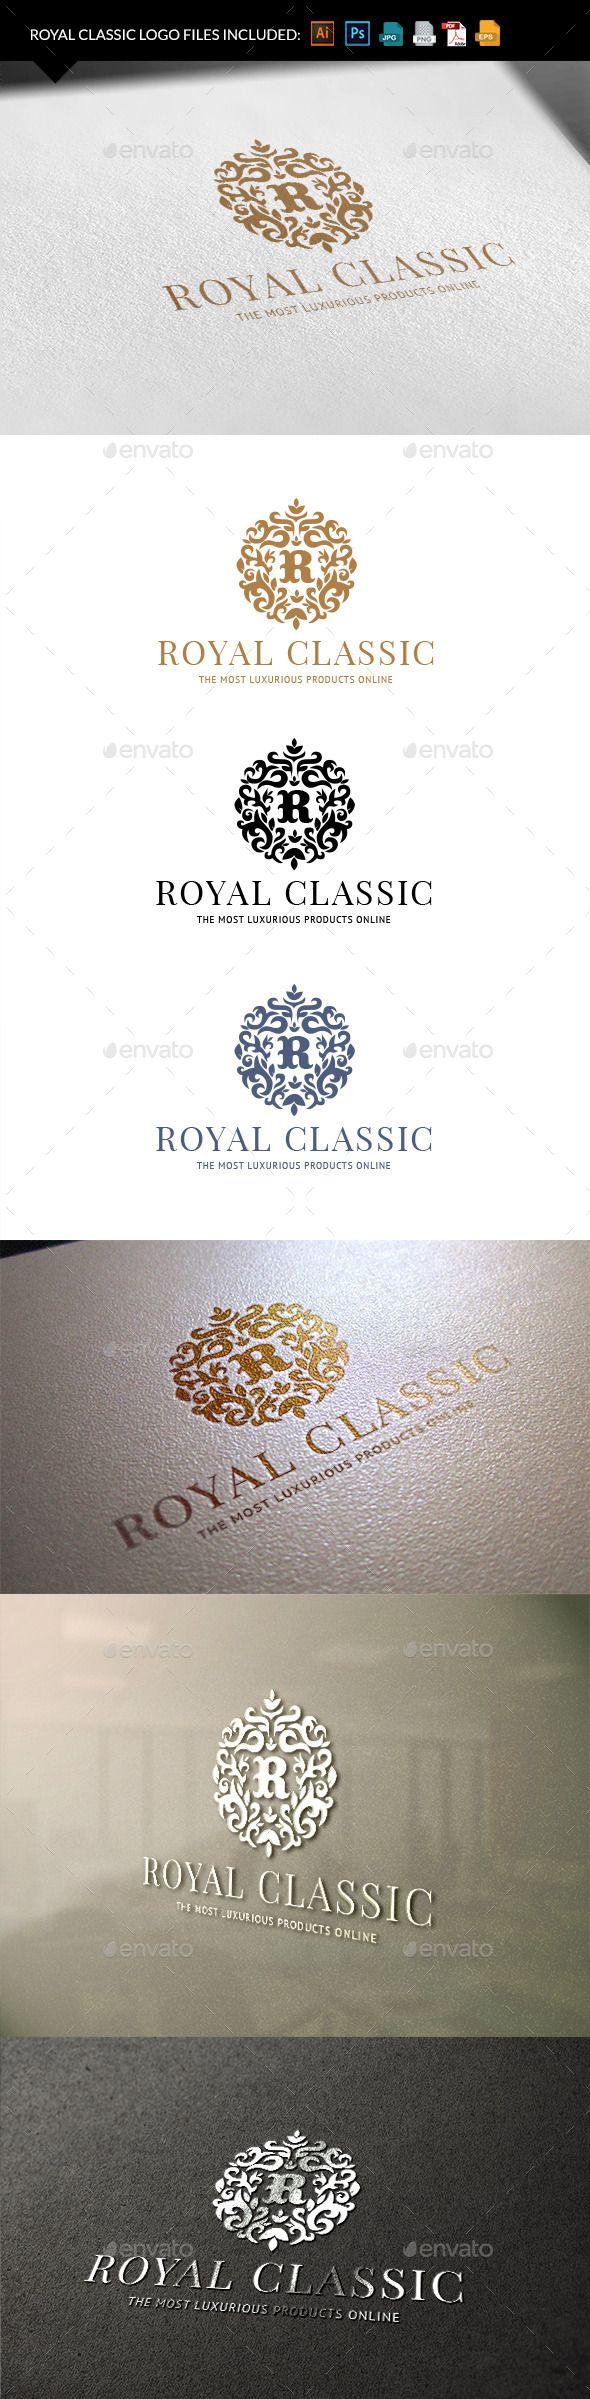 Royal Classic Logo Template #design #logodesign Download: http://graphicriver.net/item/royal-classic/9940997?ref=ksioks